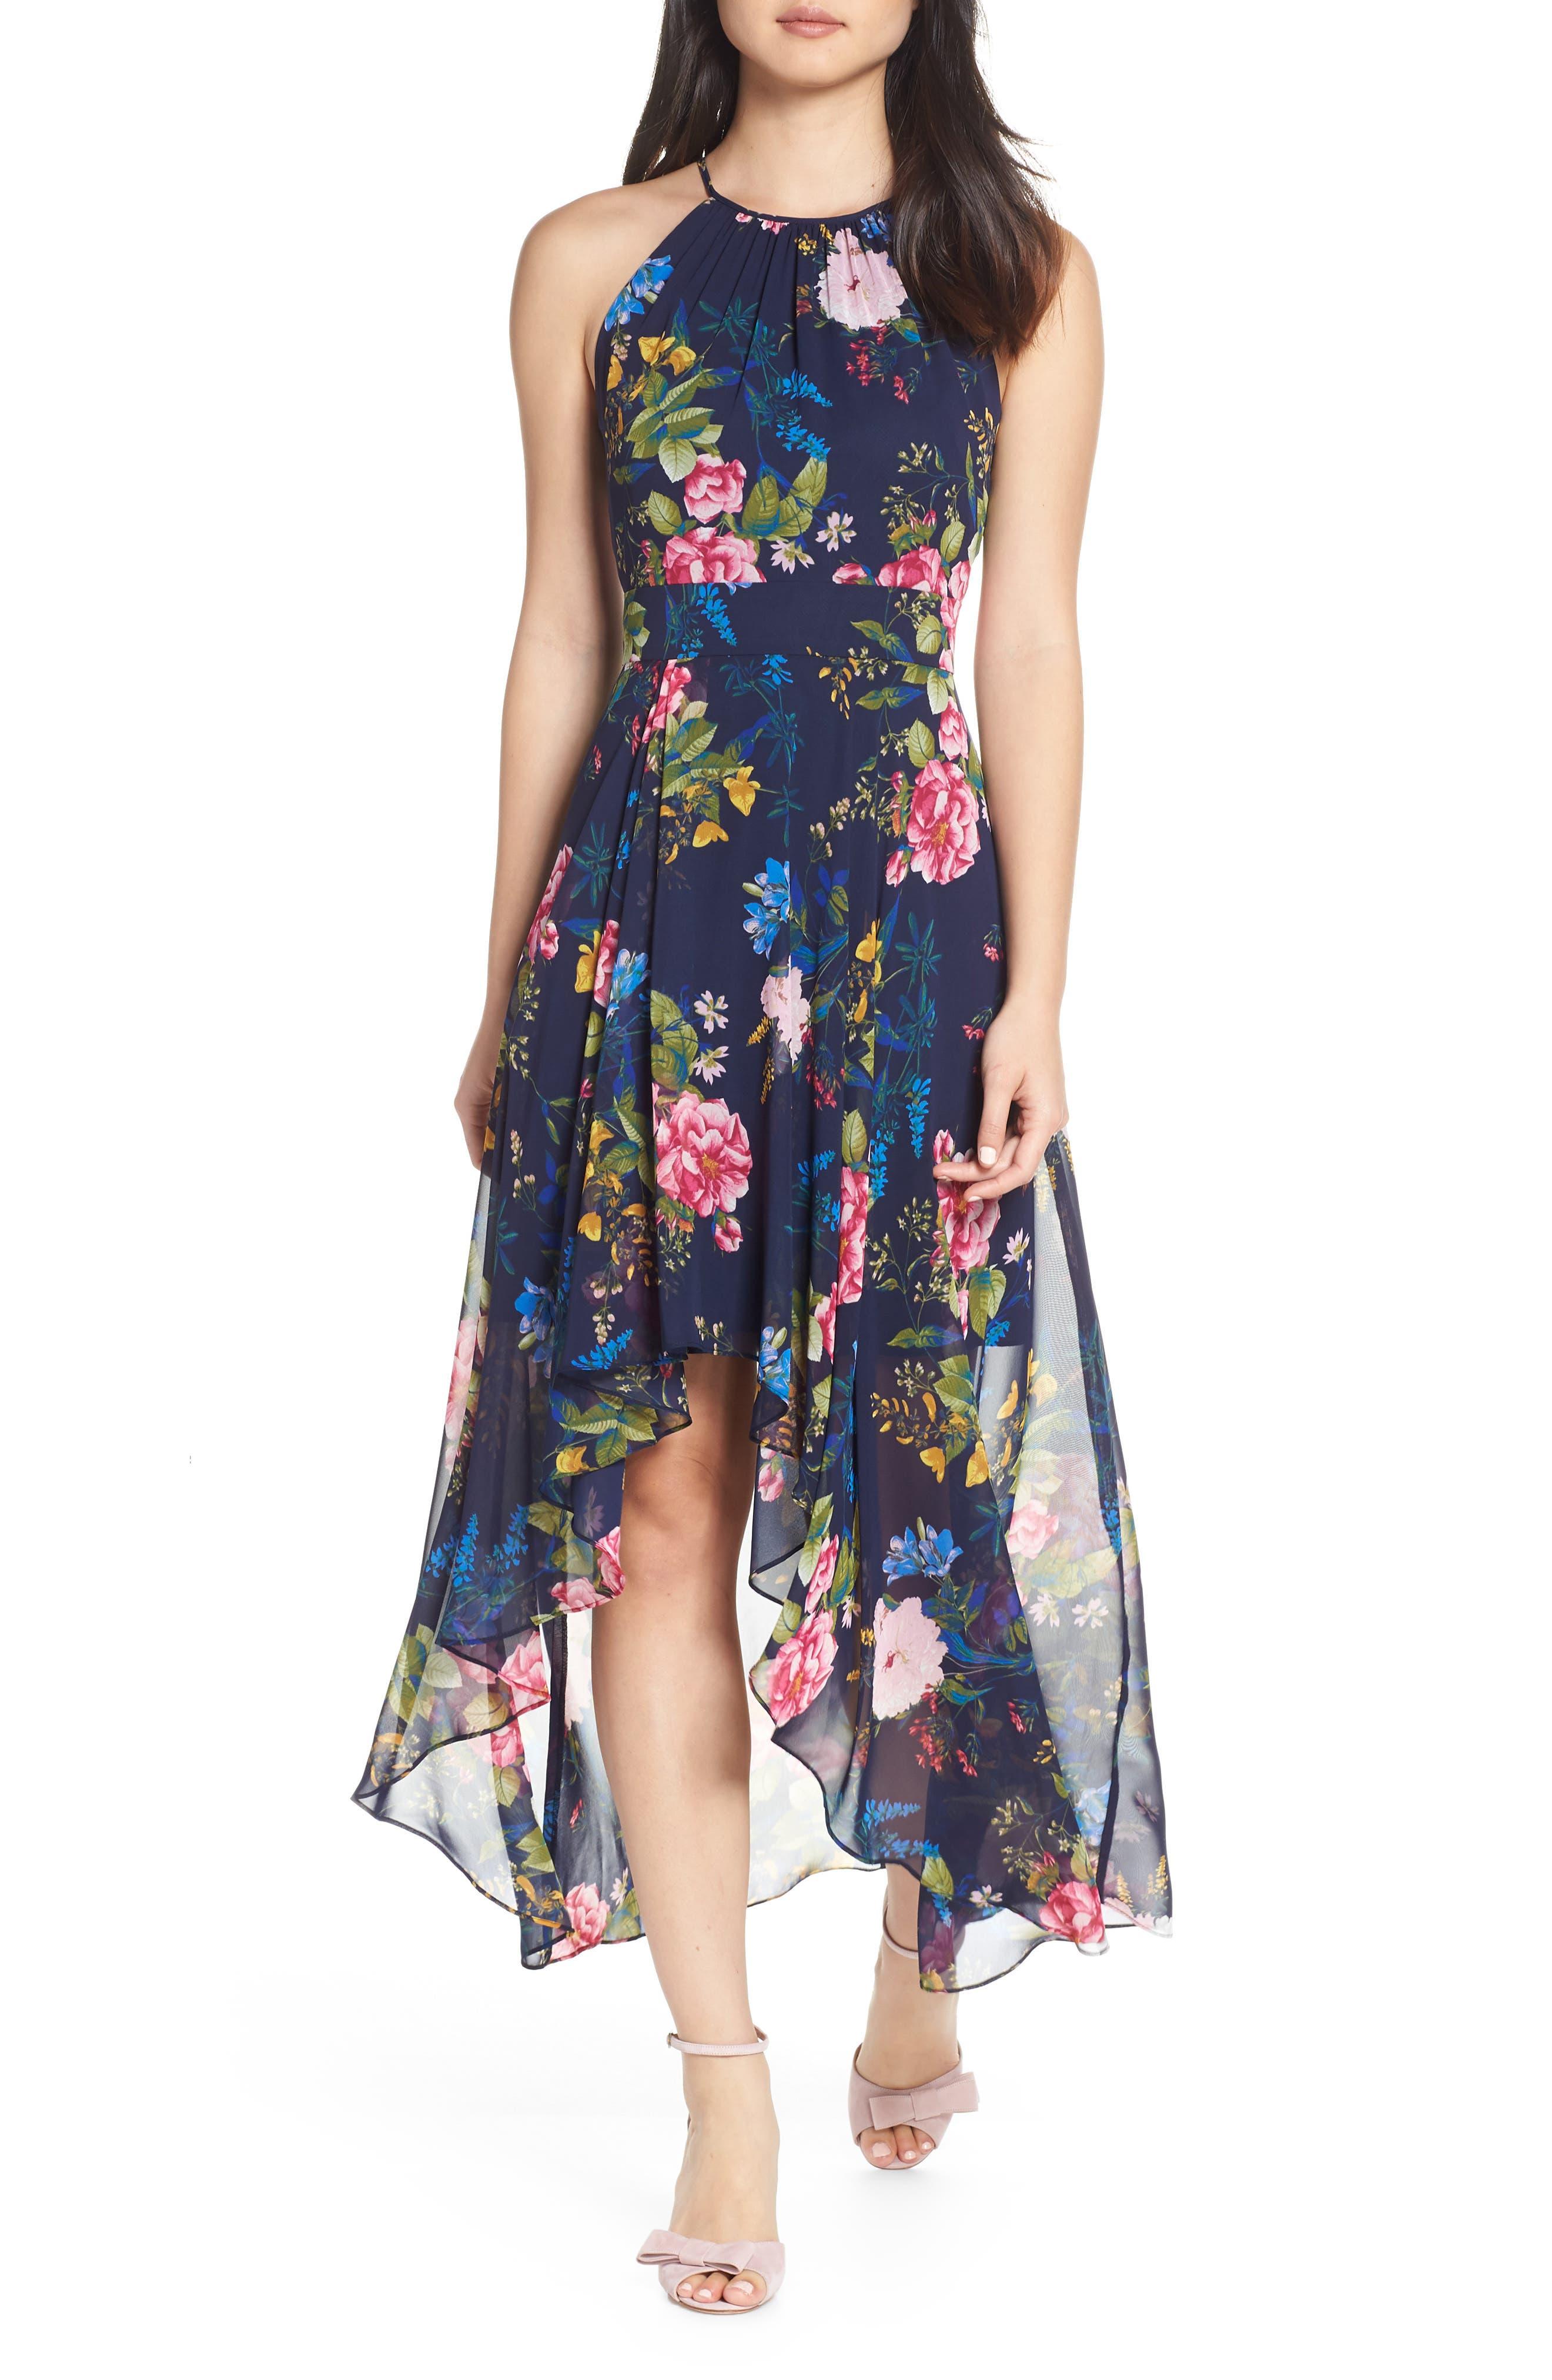 ELIZA J, Floral Print Chiffon Halter Dress, Main thumbnail 1, color, NAVY